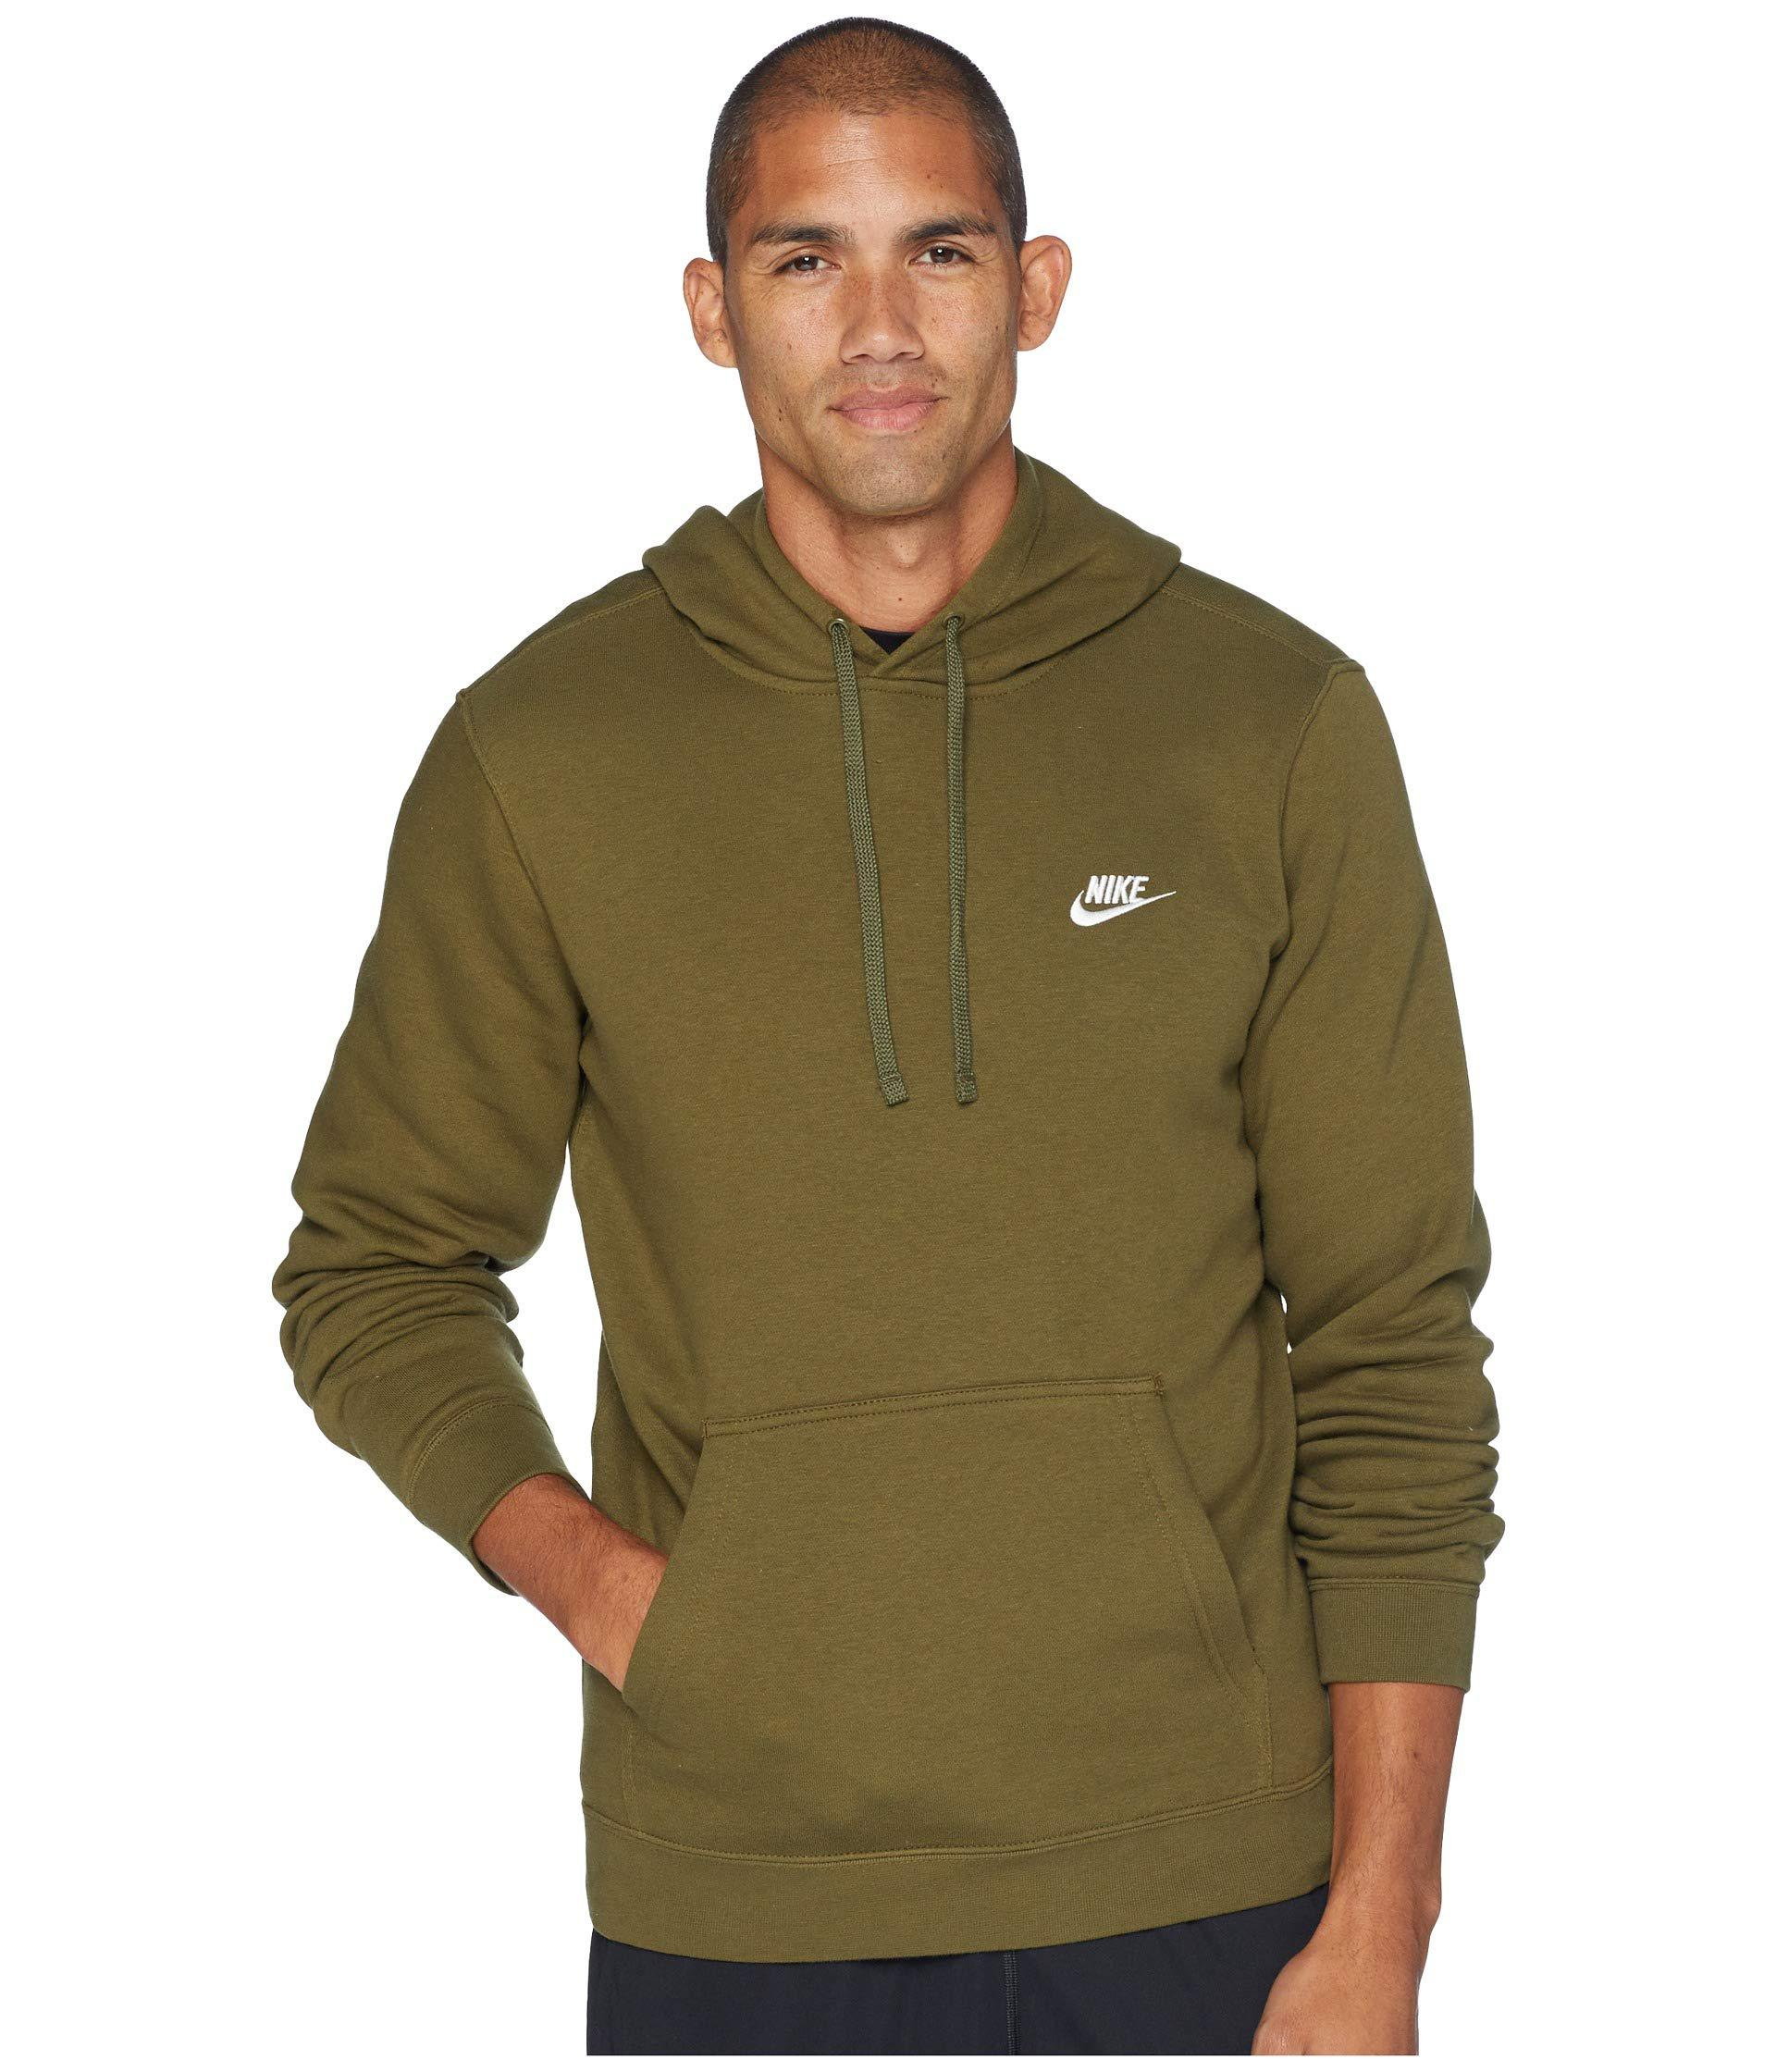 b7f514d5199 Nike - Green Club Fleece Pullover Hoodie for Men - Lyst. View fullscreen